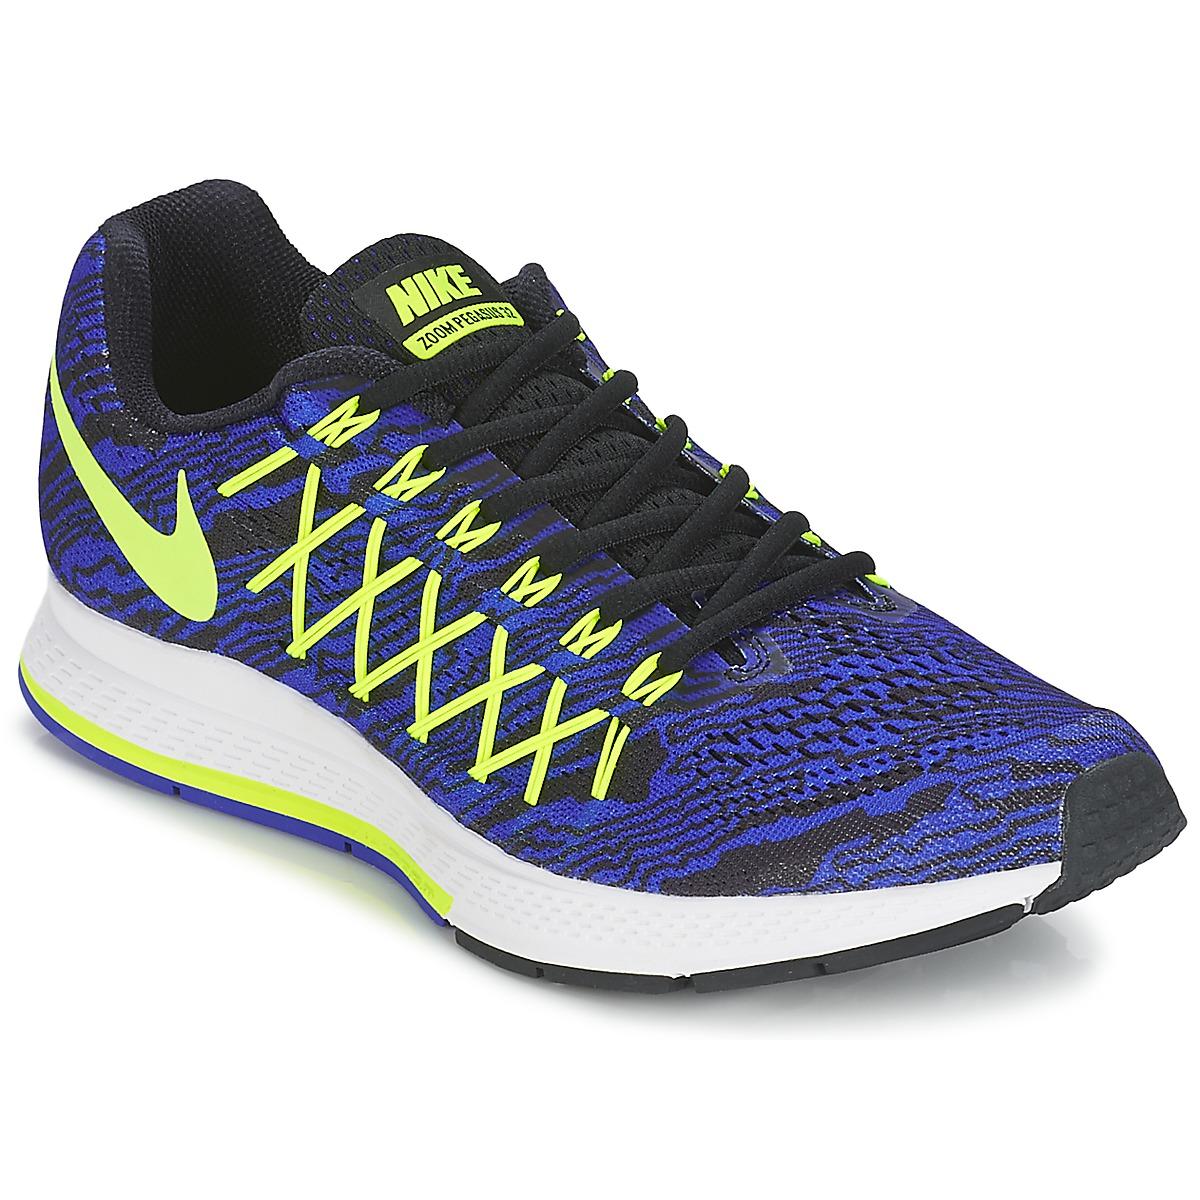 nike air max 1 premium sp - Nike AIR ZOOM PEGASUS 32 PRINT Bleu - Livraison Gratuite avec ...